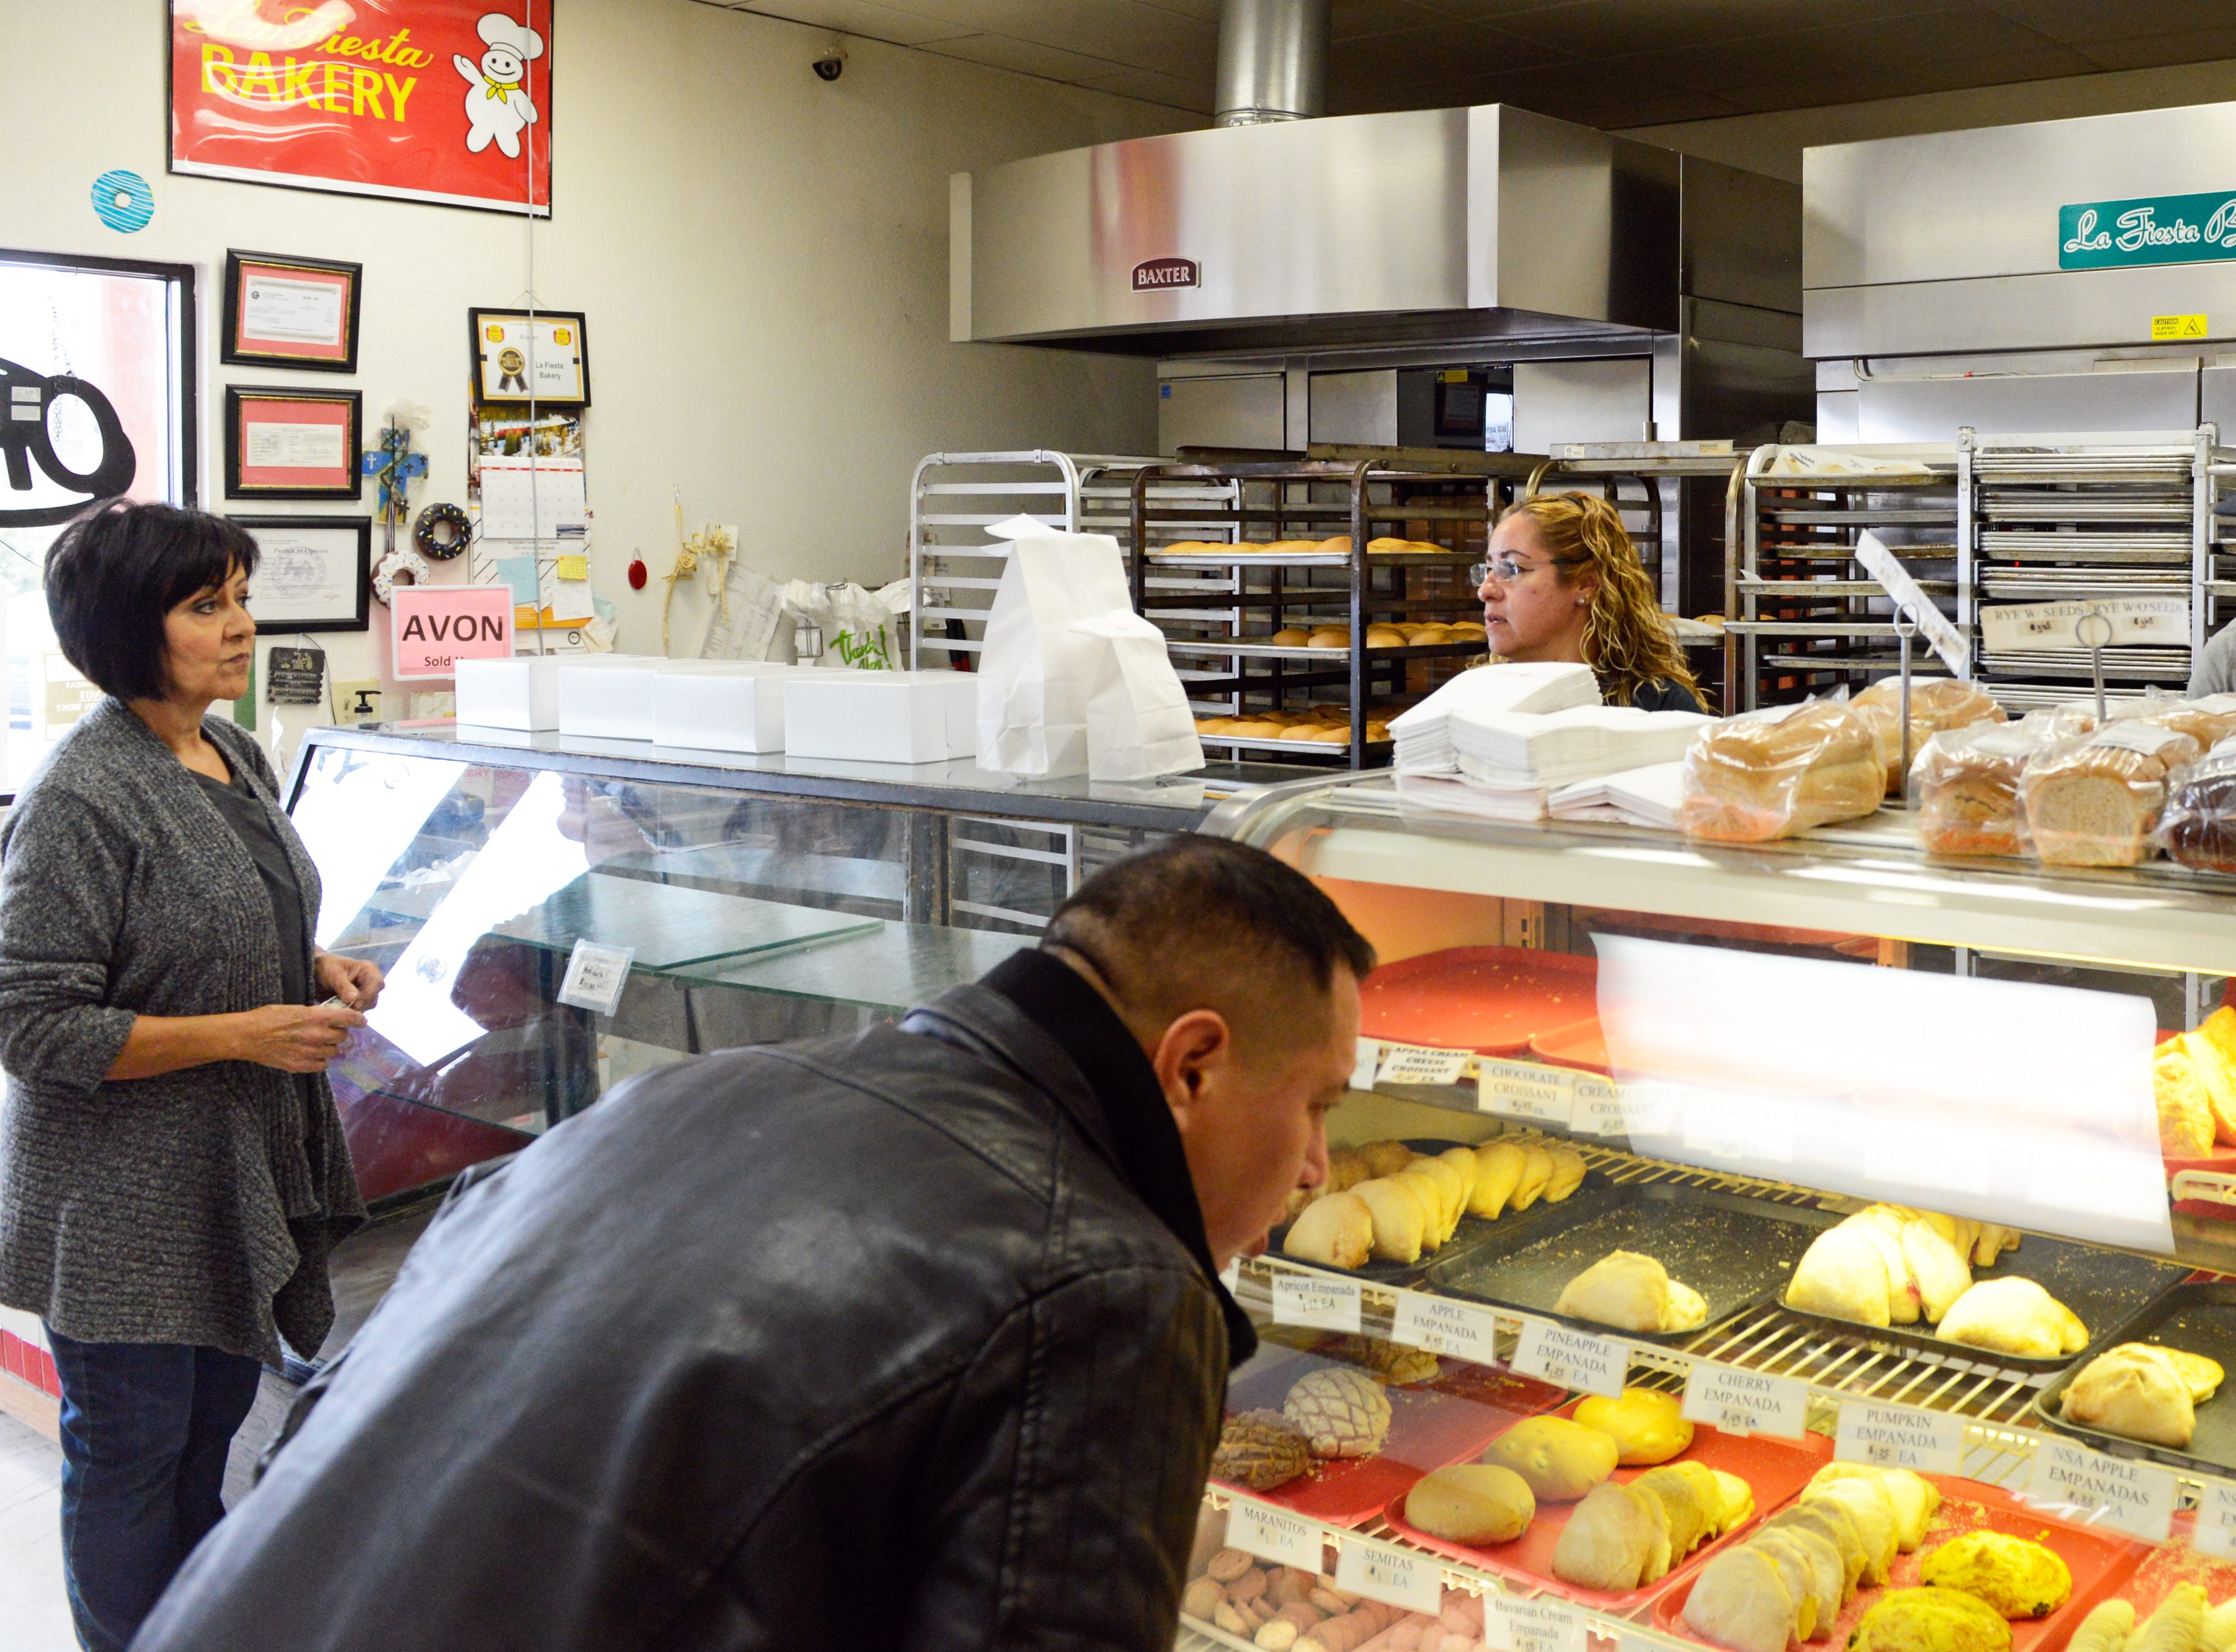 La Fiesta Bakery staff wait on customers at the bakery on January 10, 2019.